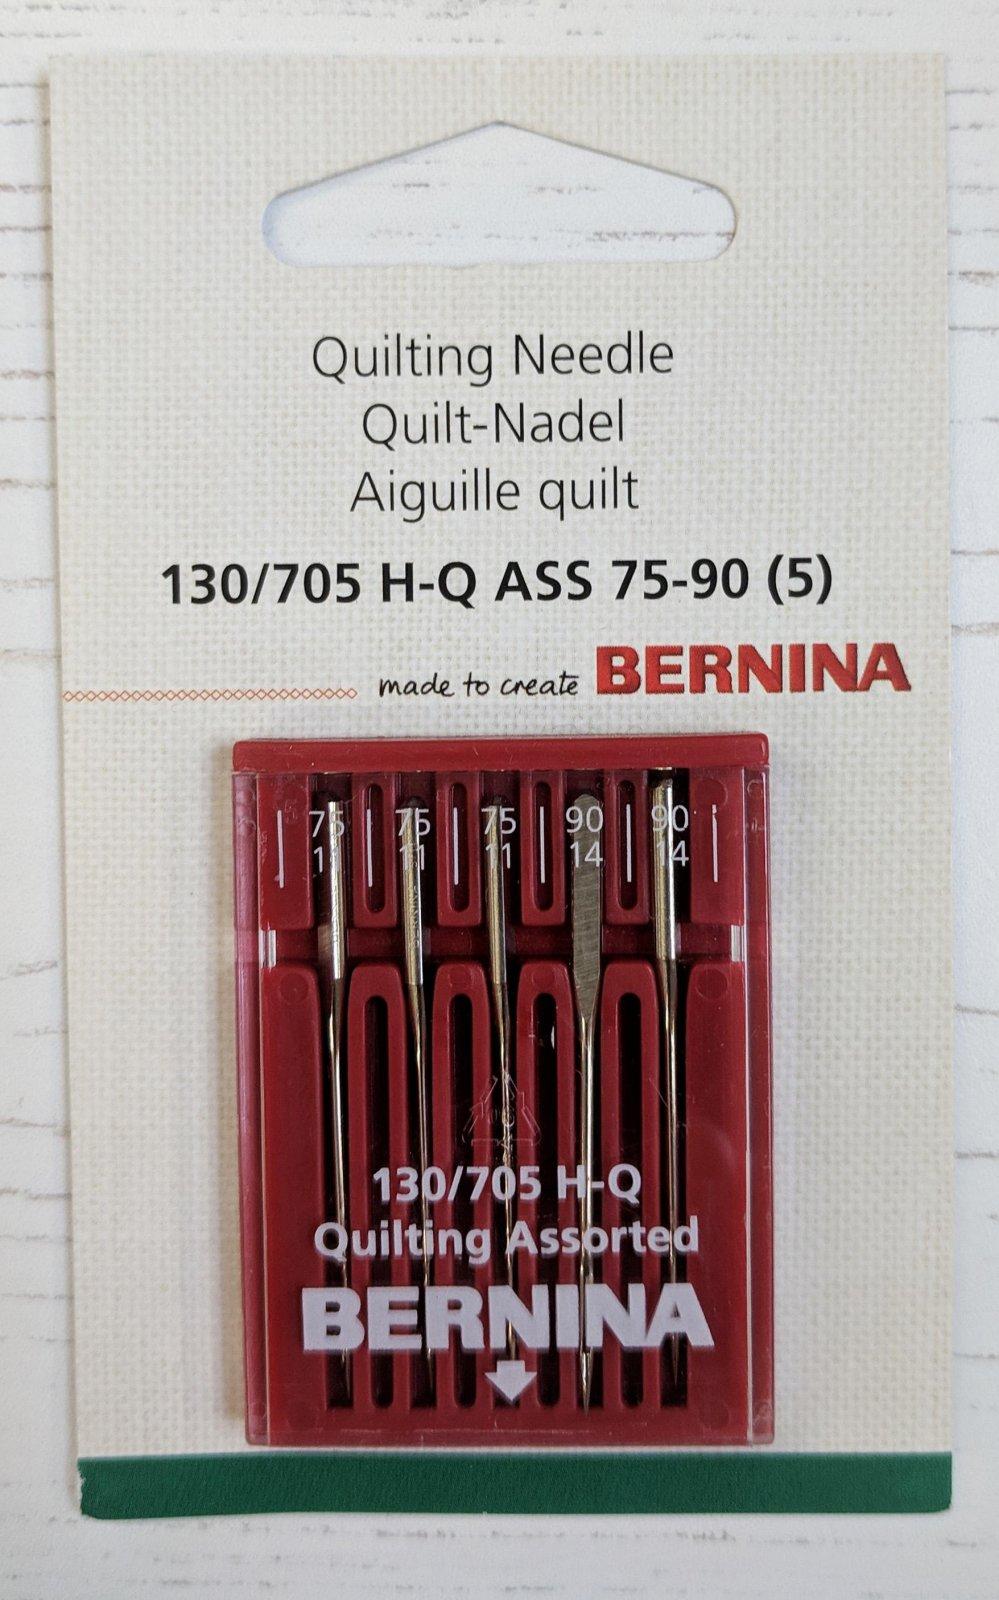 Bernina Quilting Needle 130/705 H Assorted 70/90